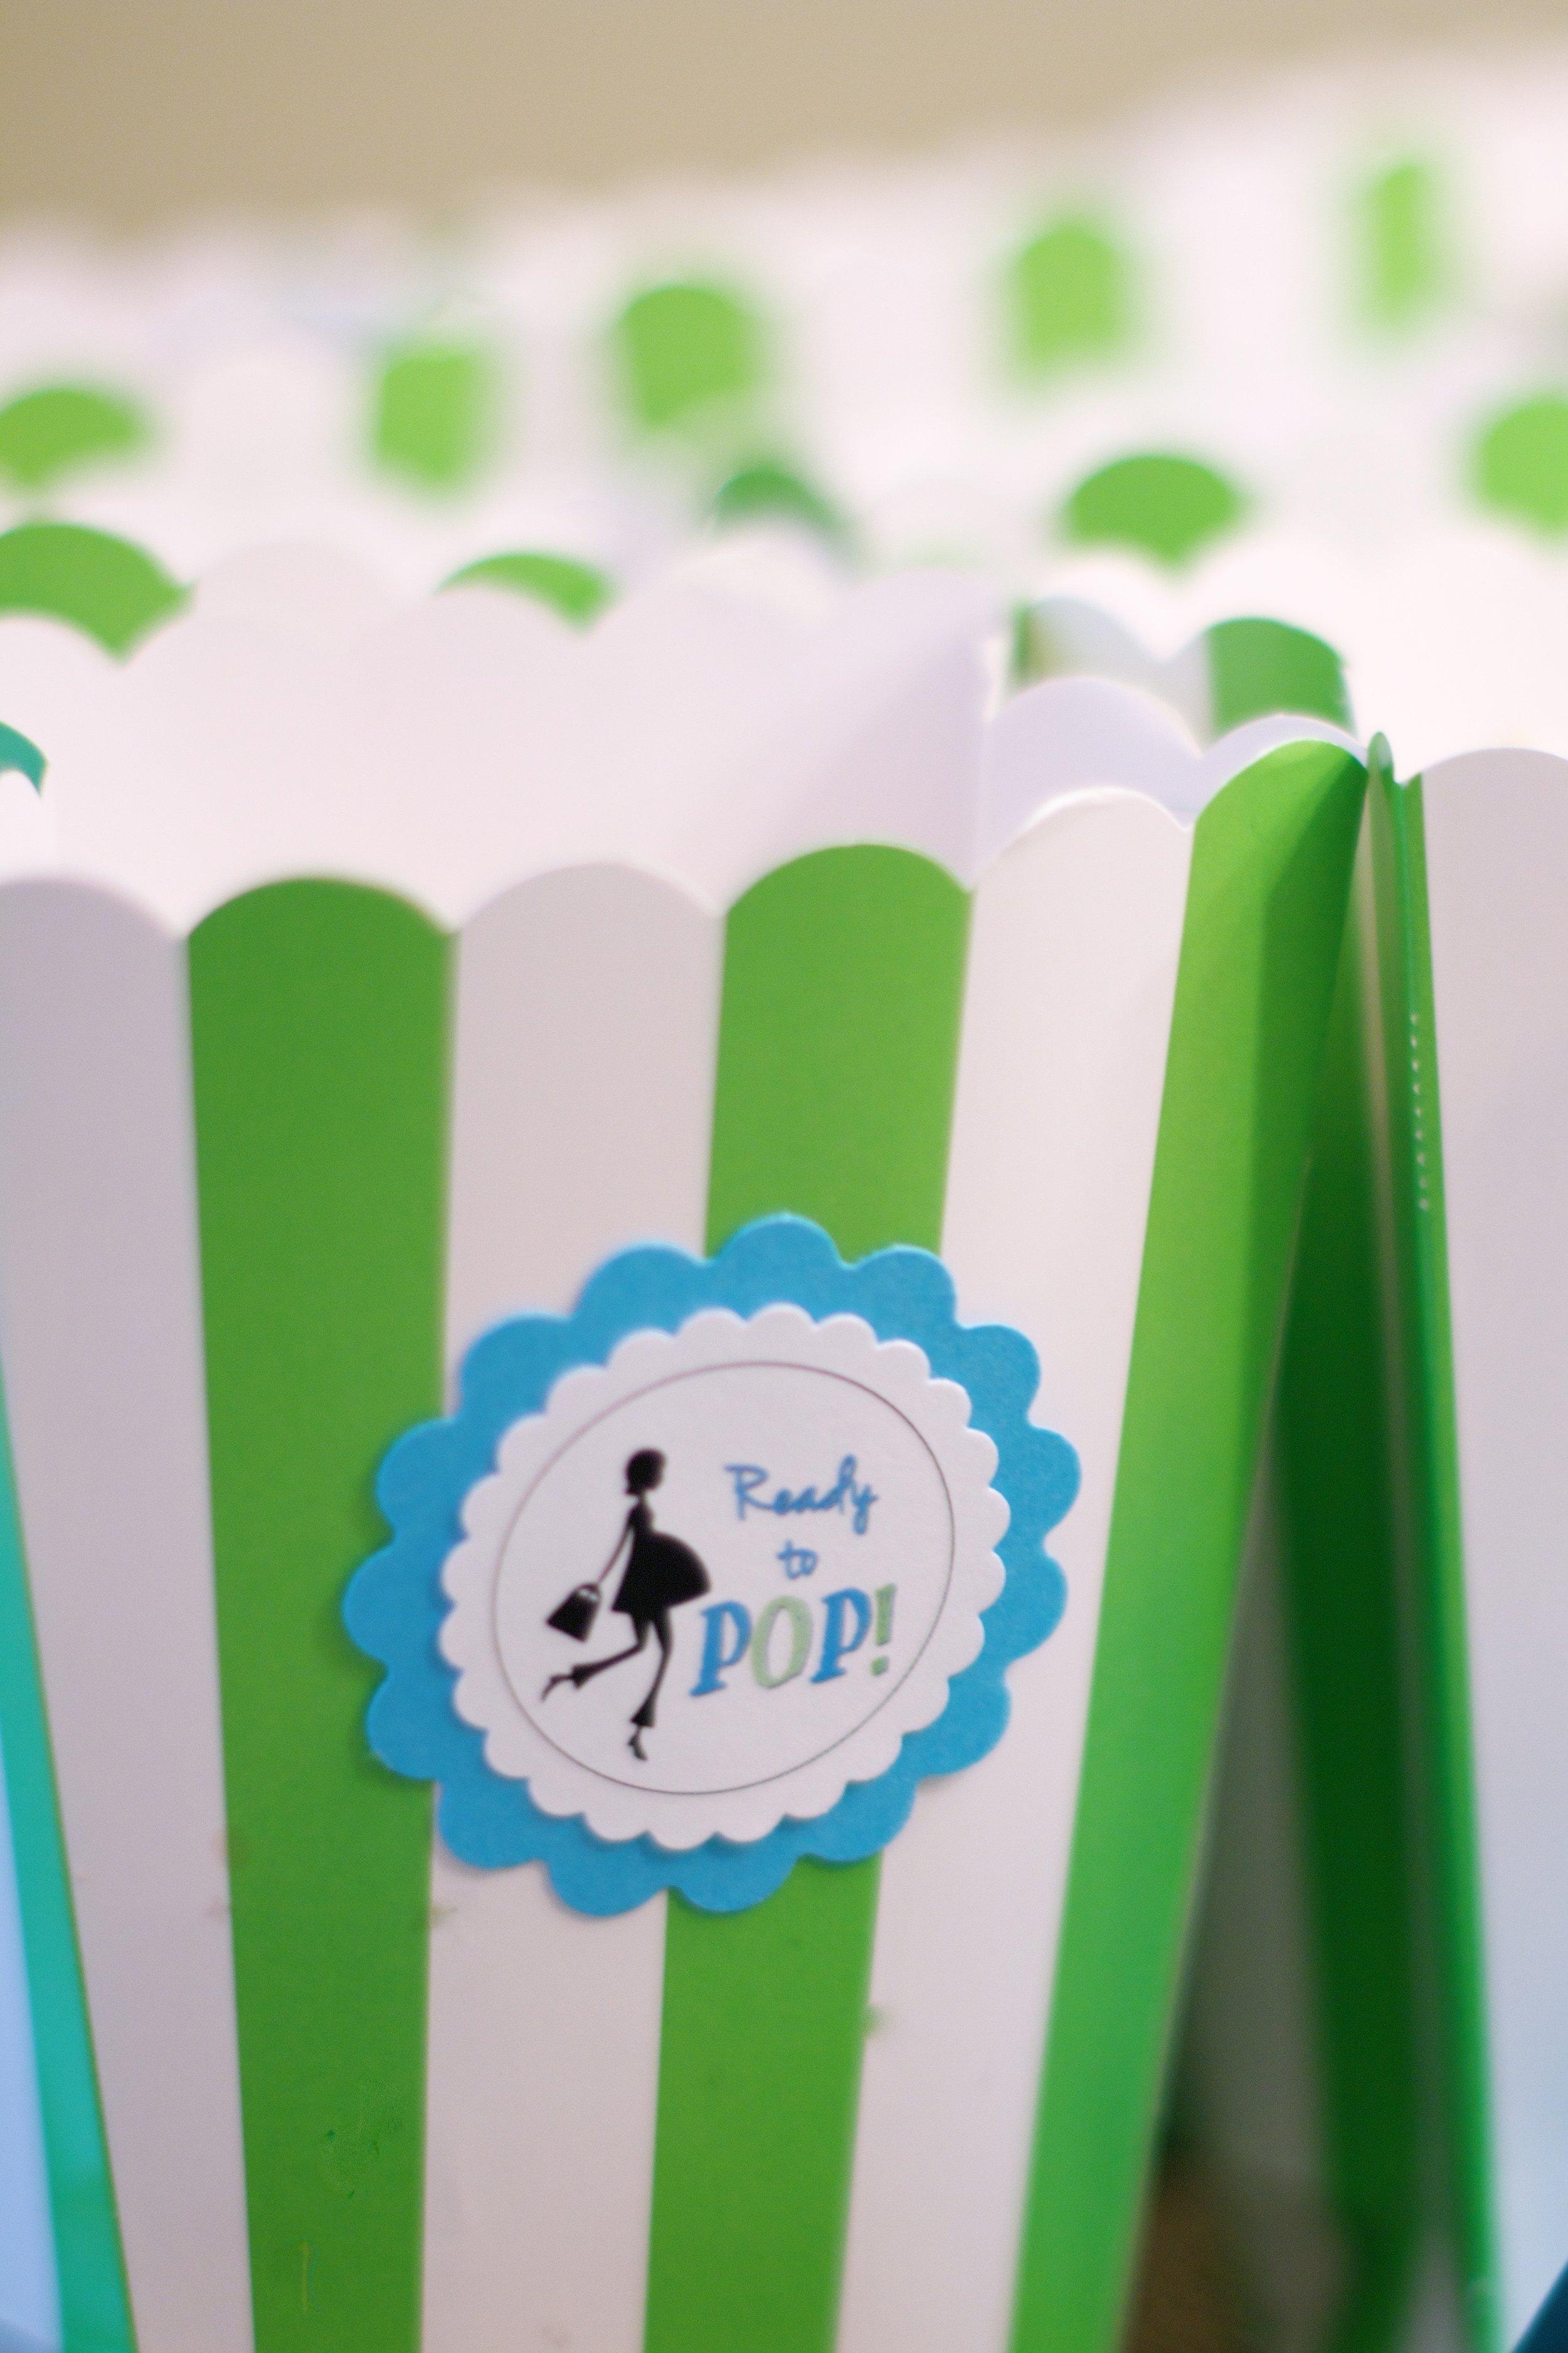 ready-to-pop-popcorn-bags.jpg